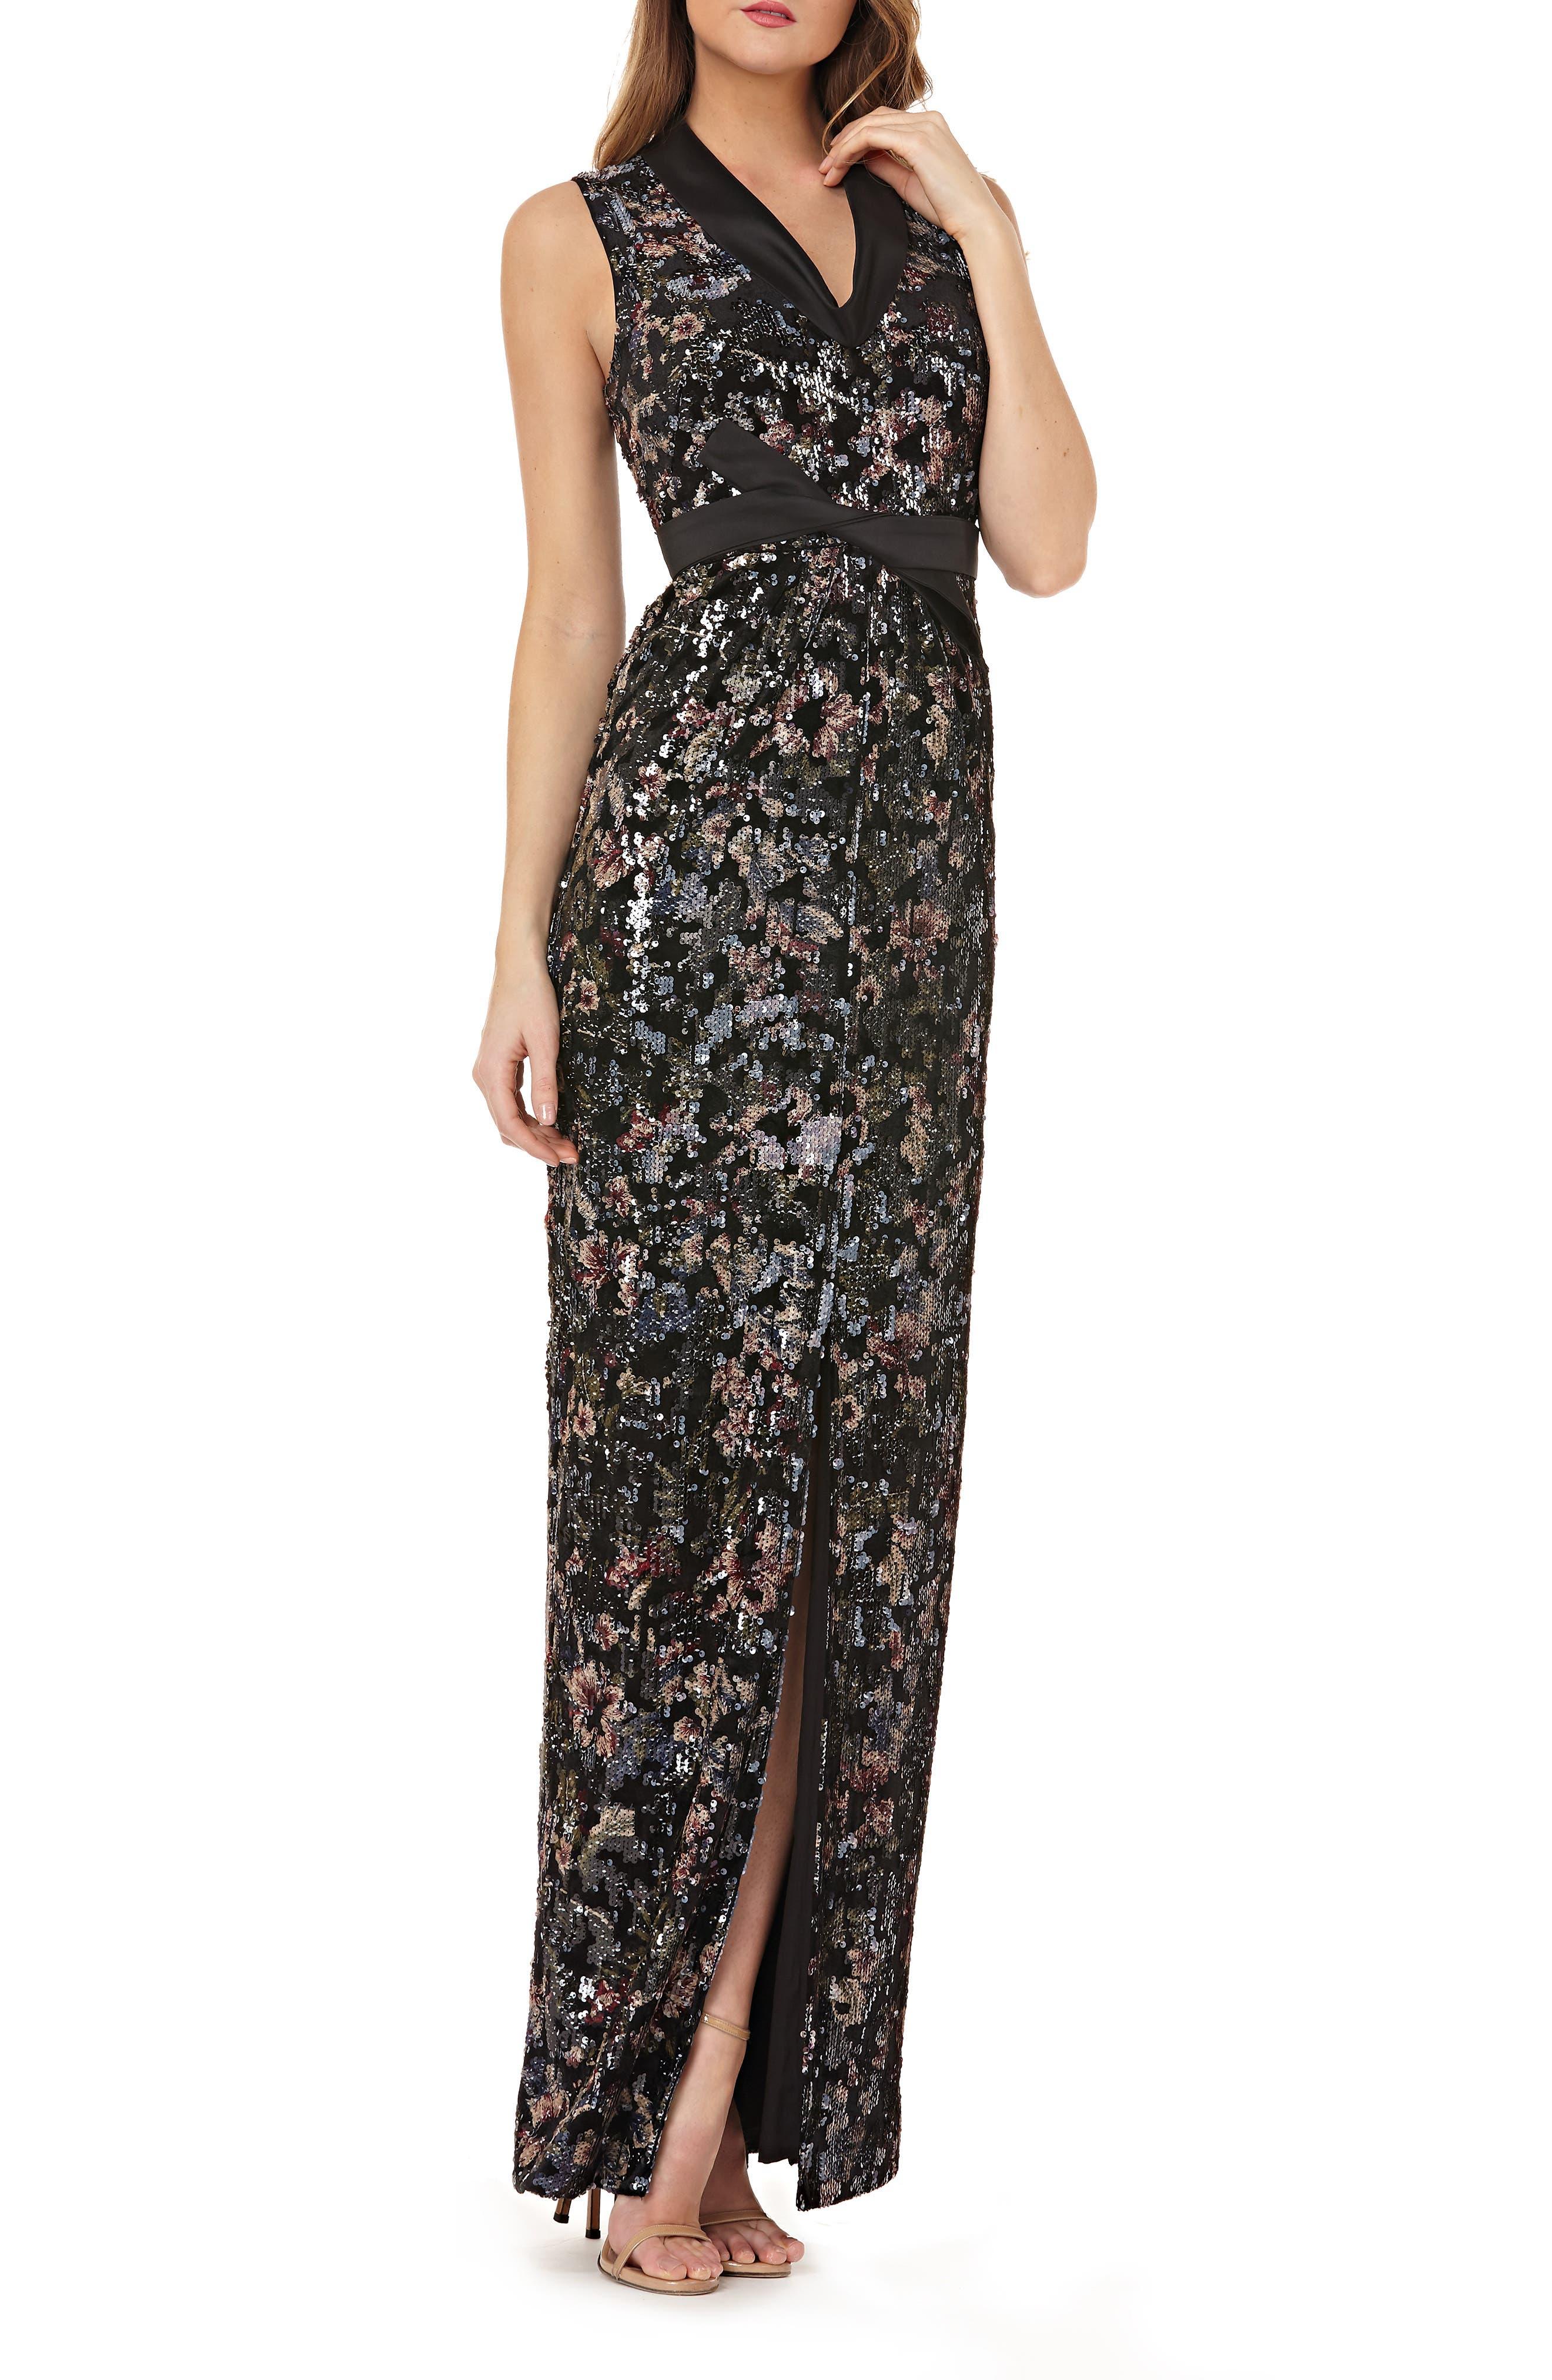 KAY UNGER Stretch Velvet Gown W/ Sequins & Satin in Black Multi